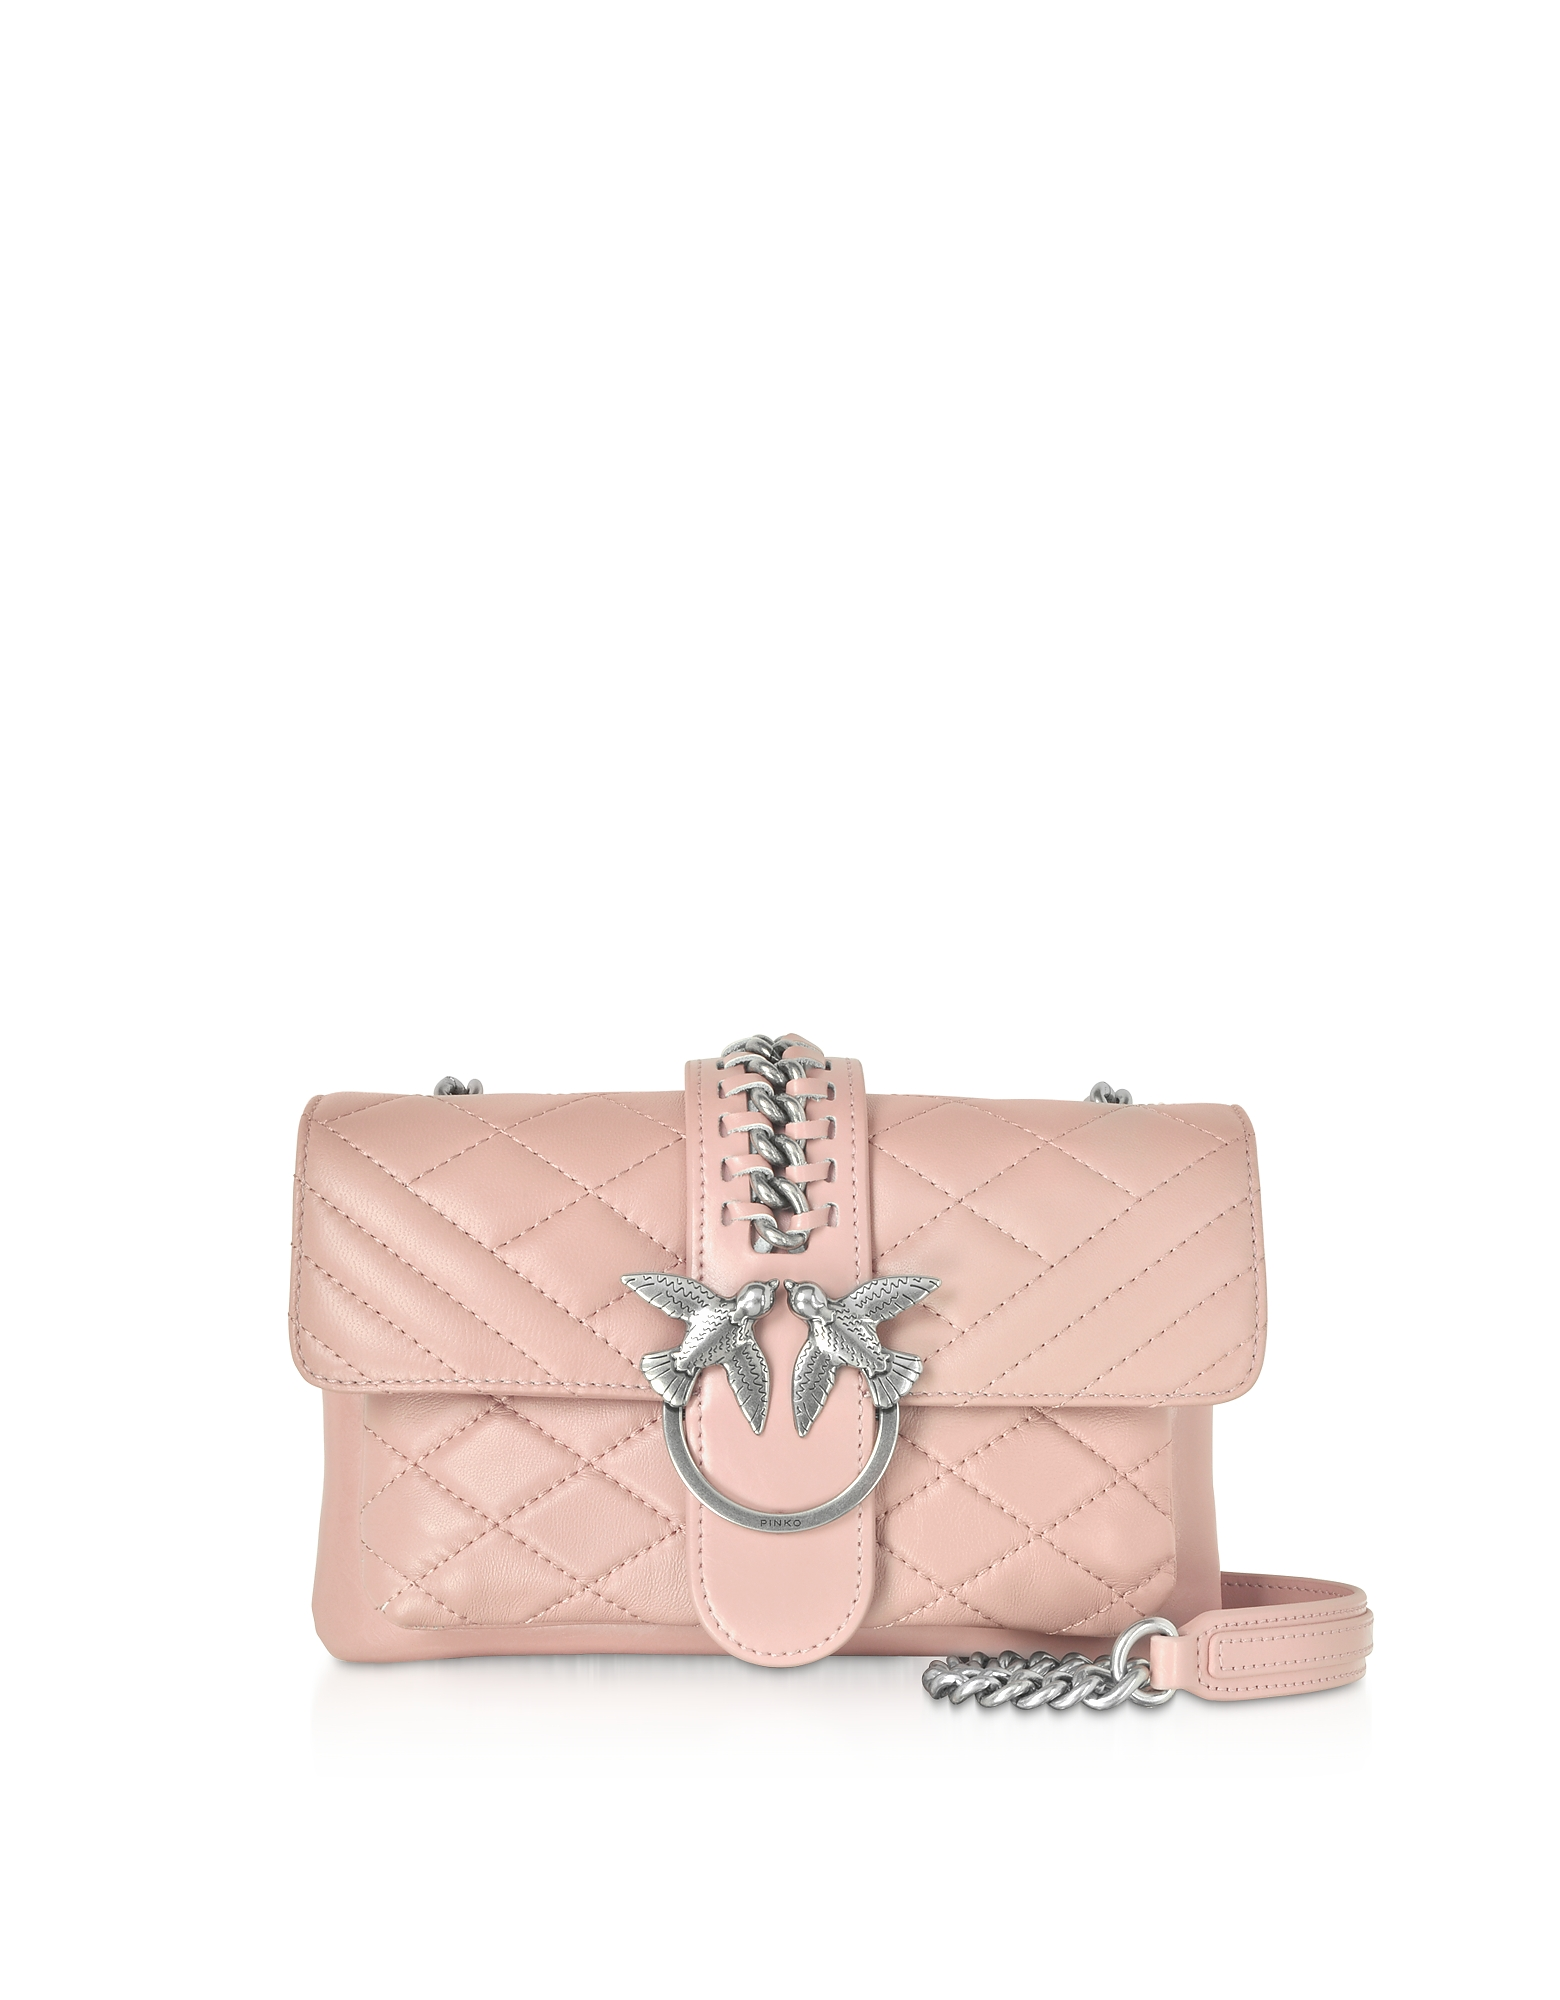 Pinko Designer Handbags, Mini Love Soft Mix Crossbody Bag